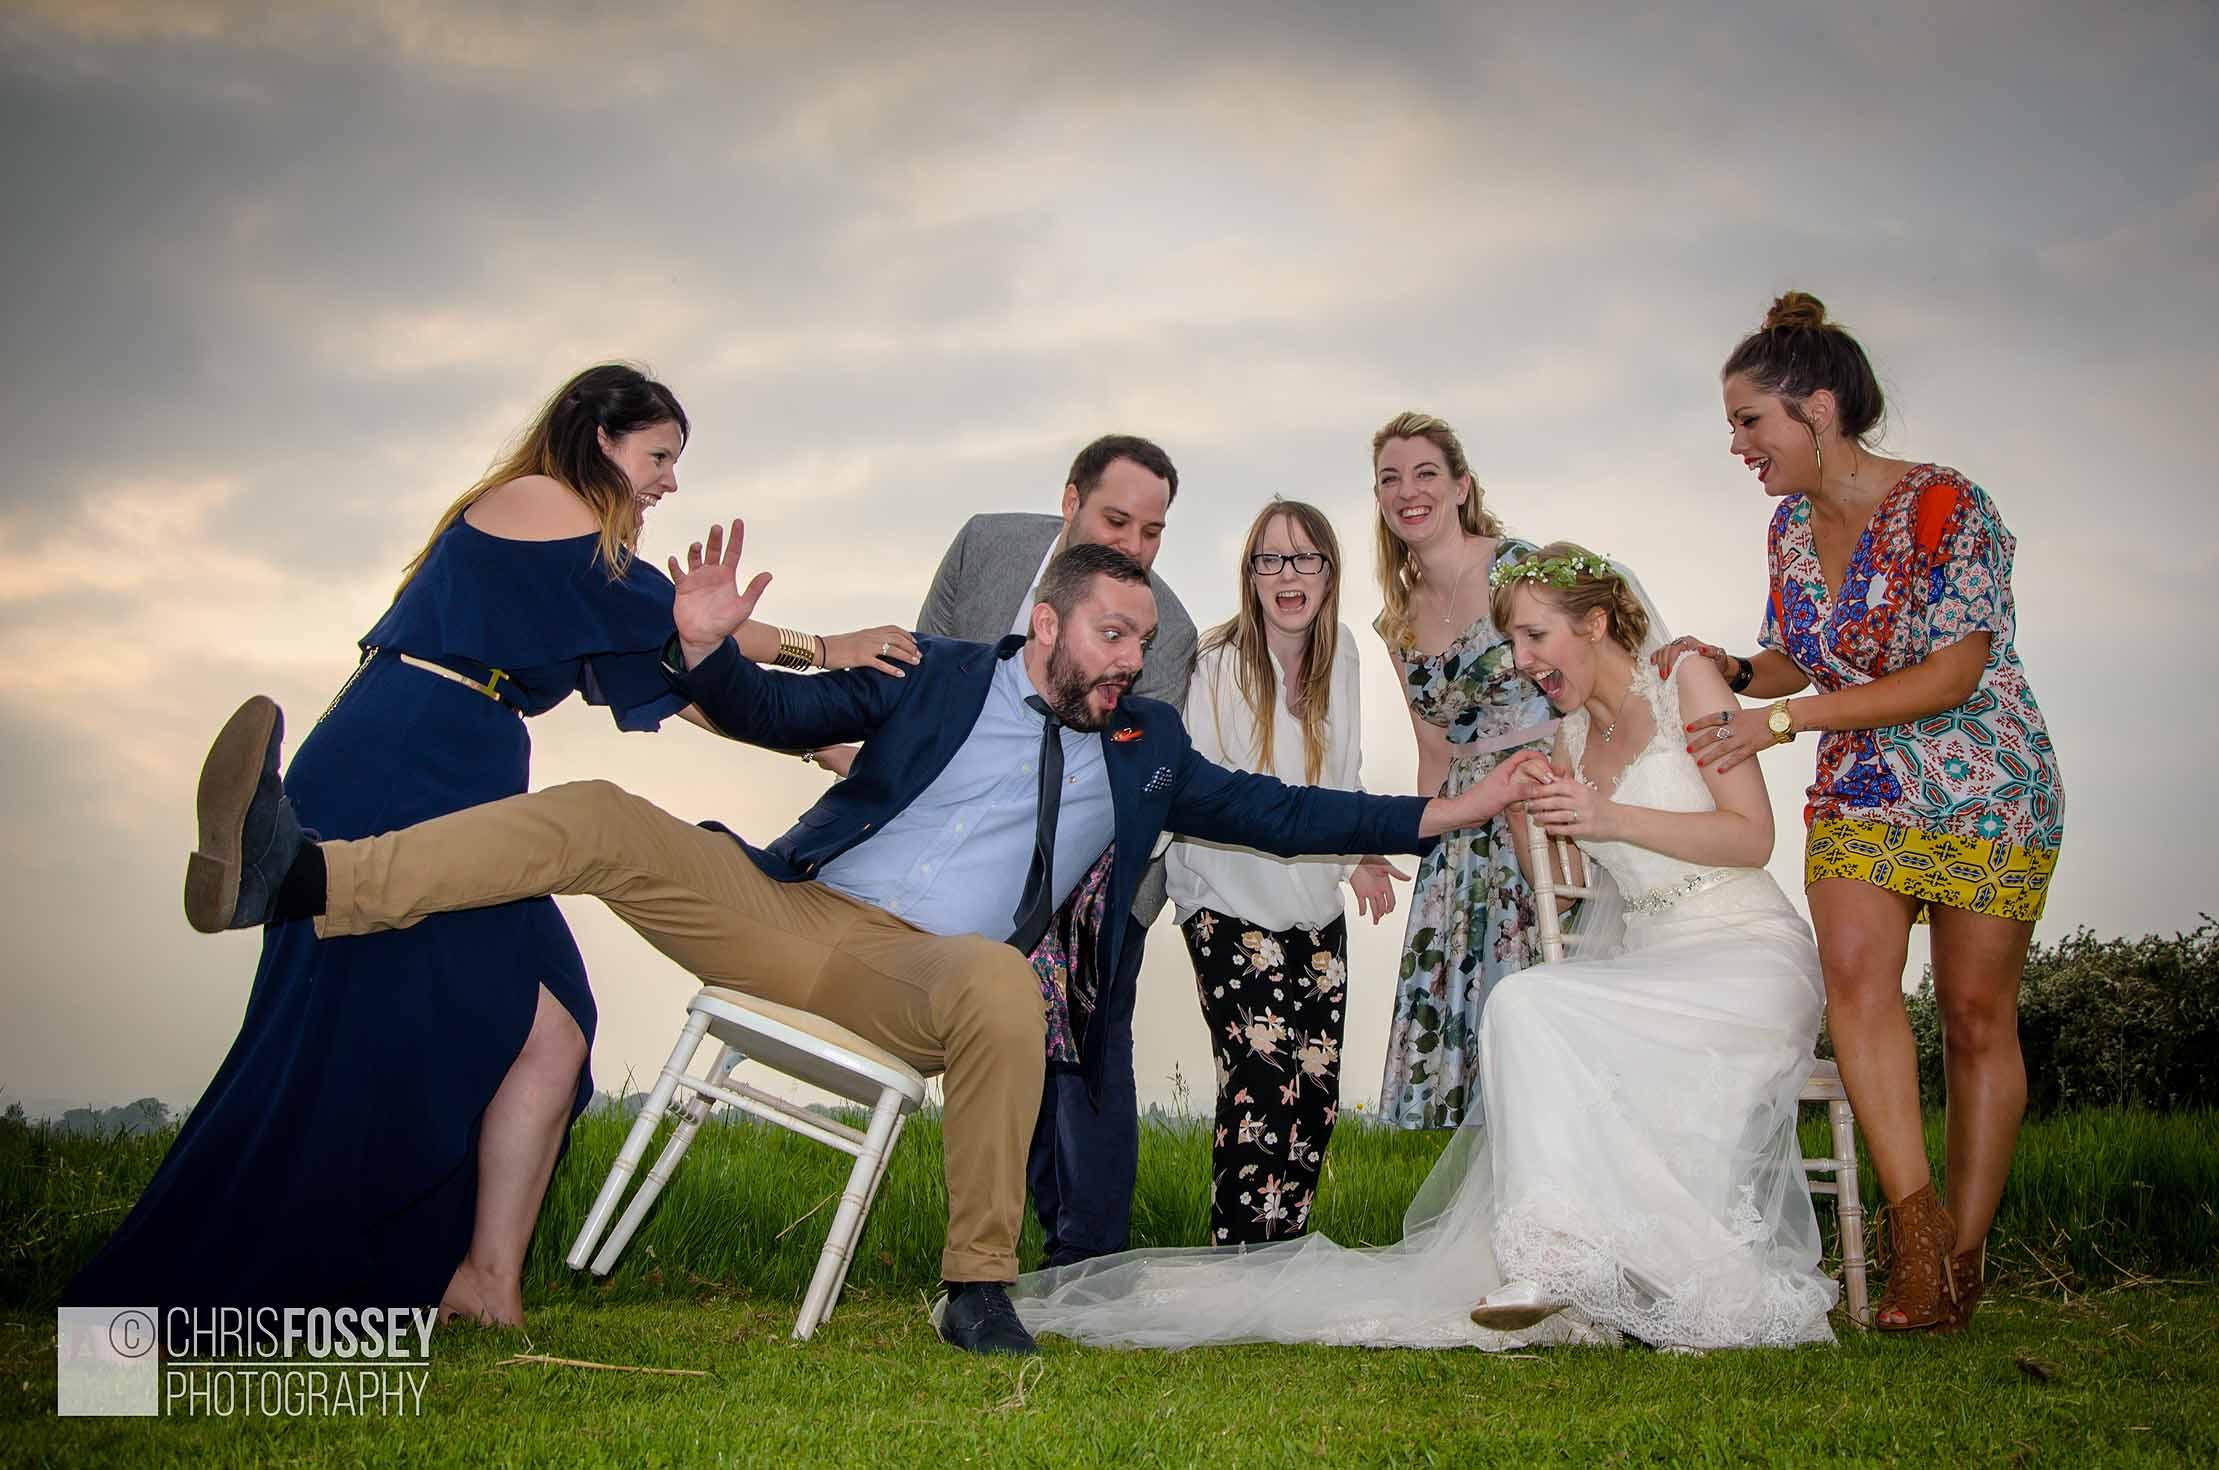 Wedding Photography Warwickshire Chris Fossey Photographer for Warwickshire Cotswolds West Midlands UK